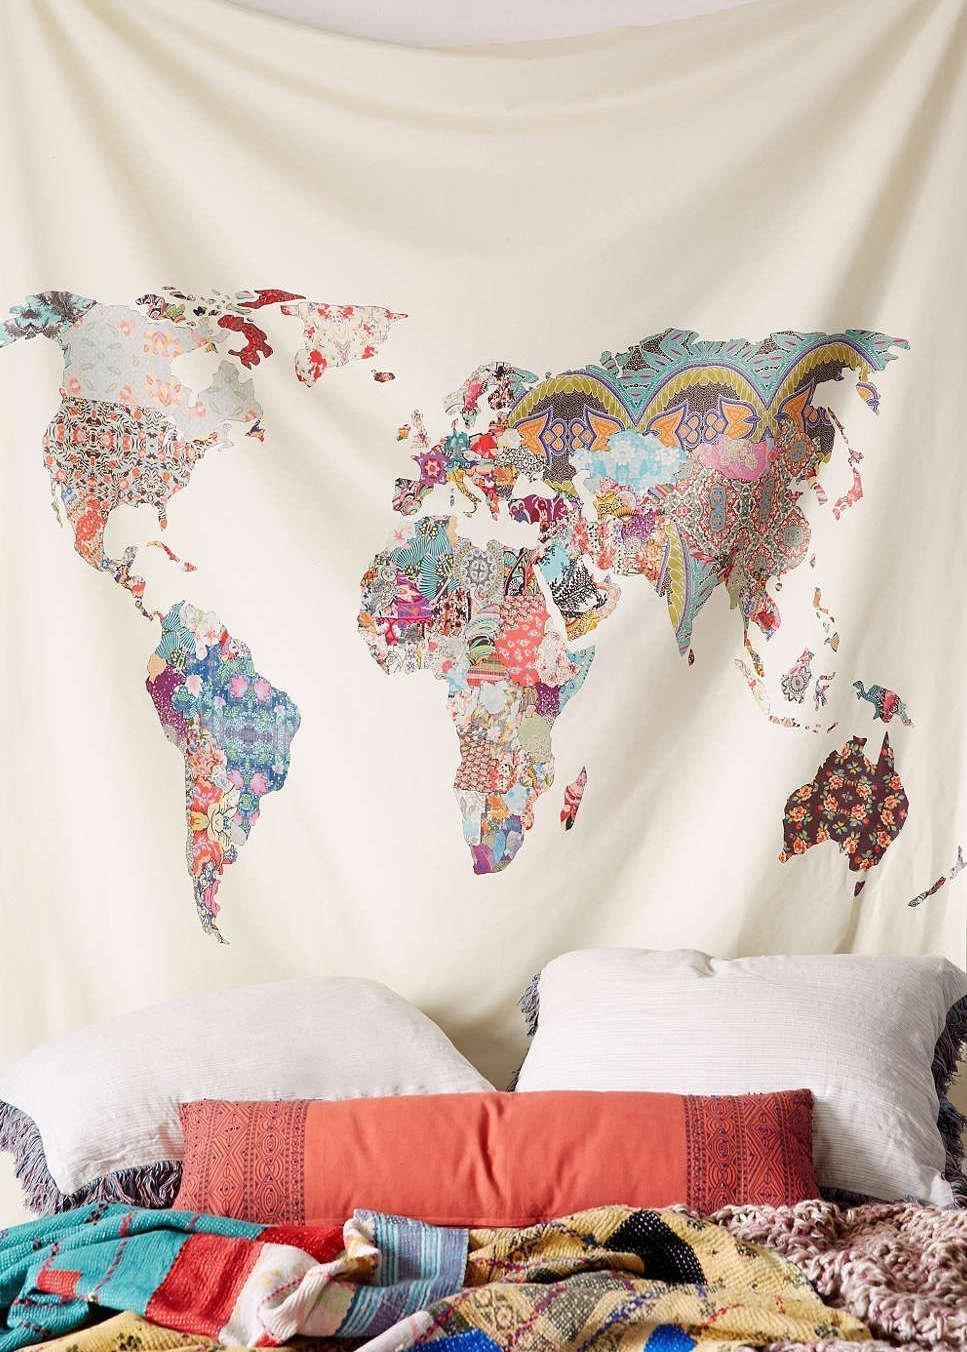 Floral World Map Tapestry Headboard Wall Art Bedspread Dorm Tapestry,60''x 60'',Twin